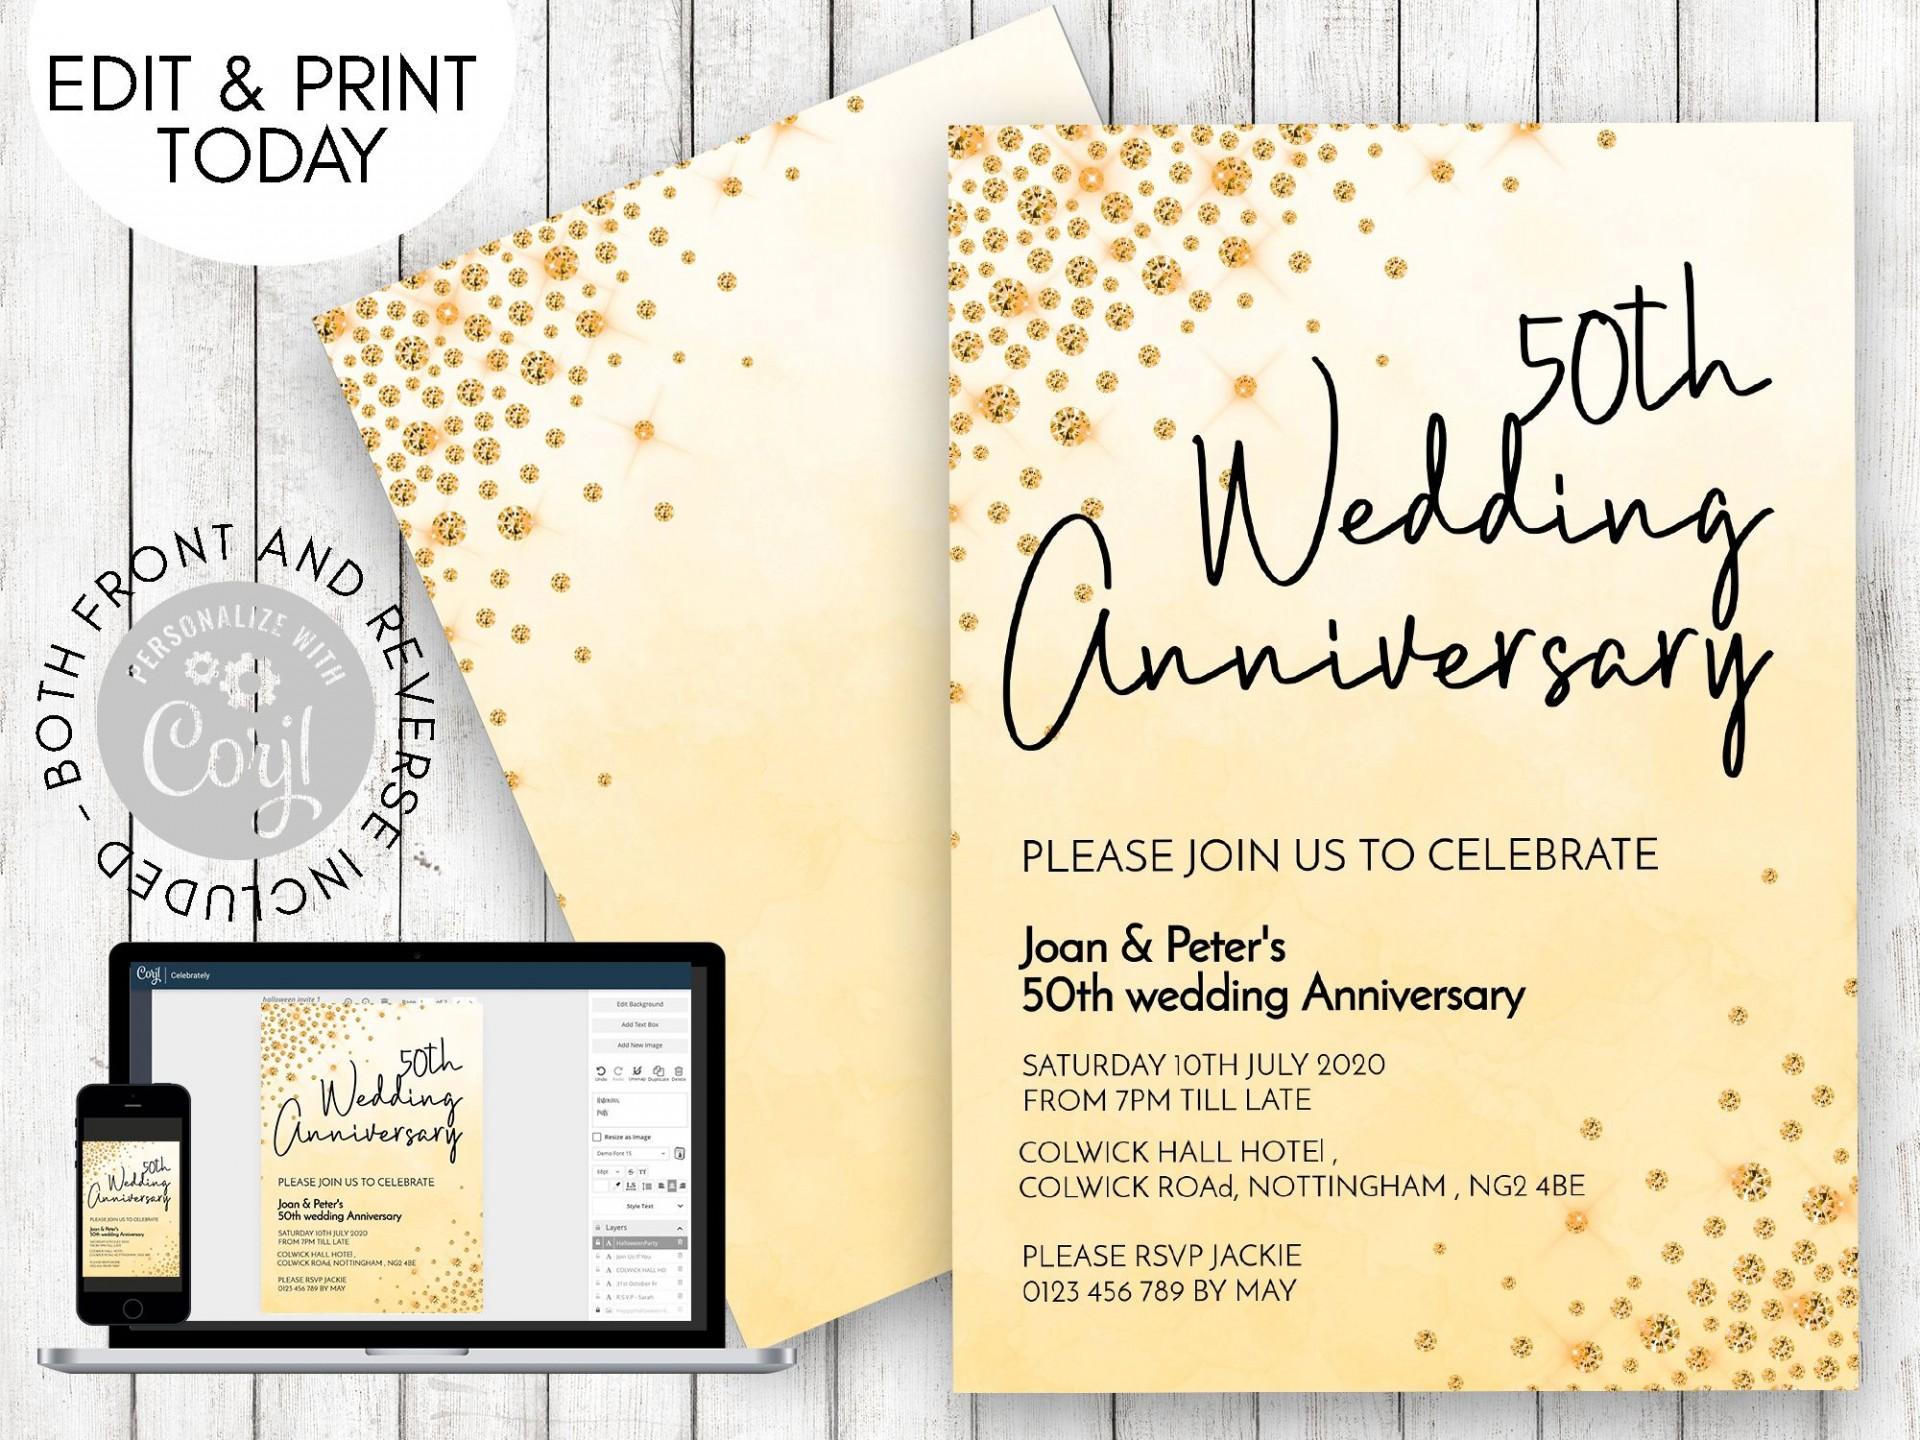 001 Striking Golden Wedding Anniversary Invitation Template Free Highest Quality  50th Microsoft Word Download1920